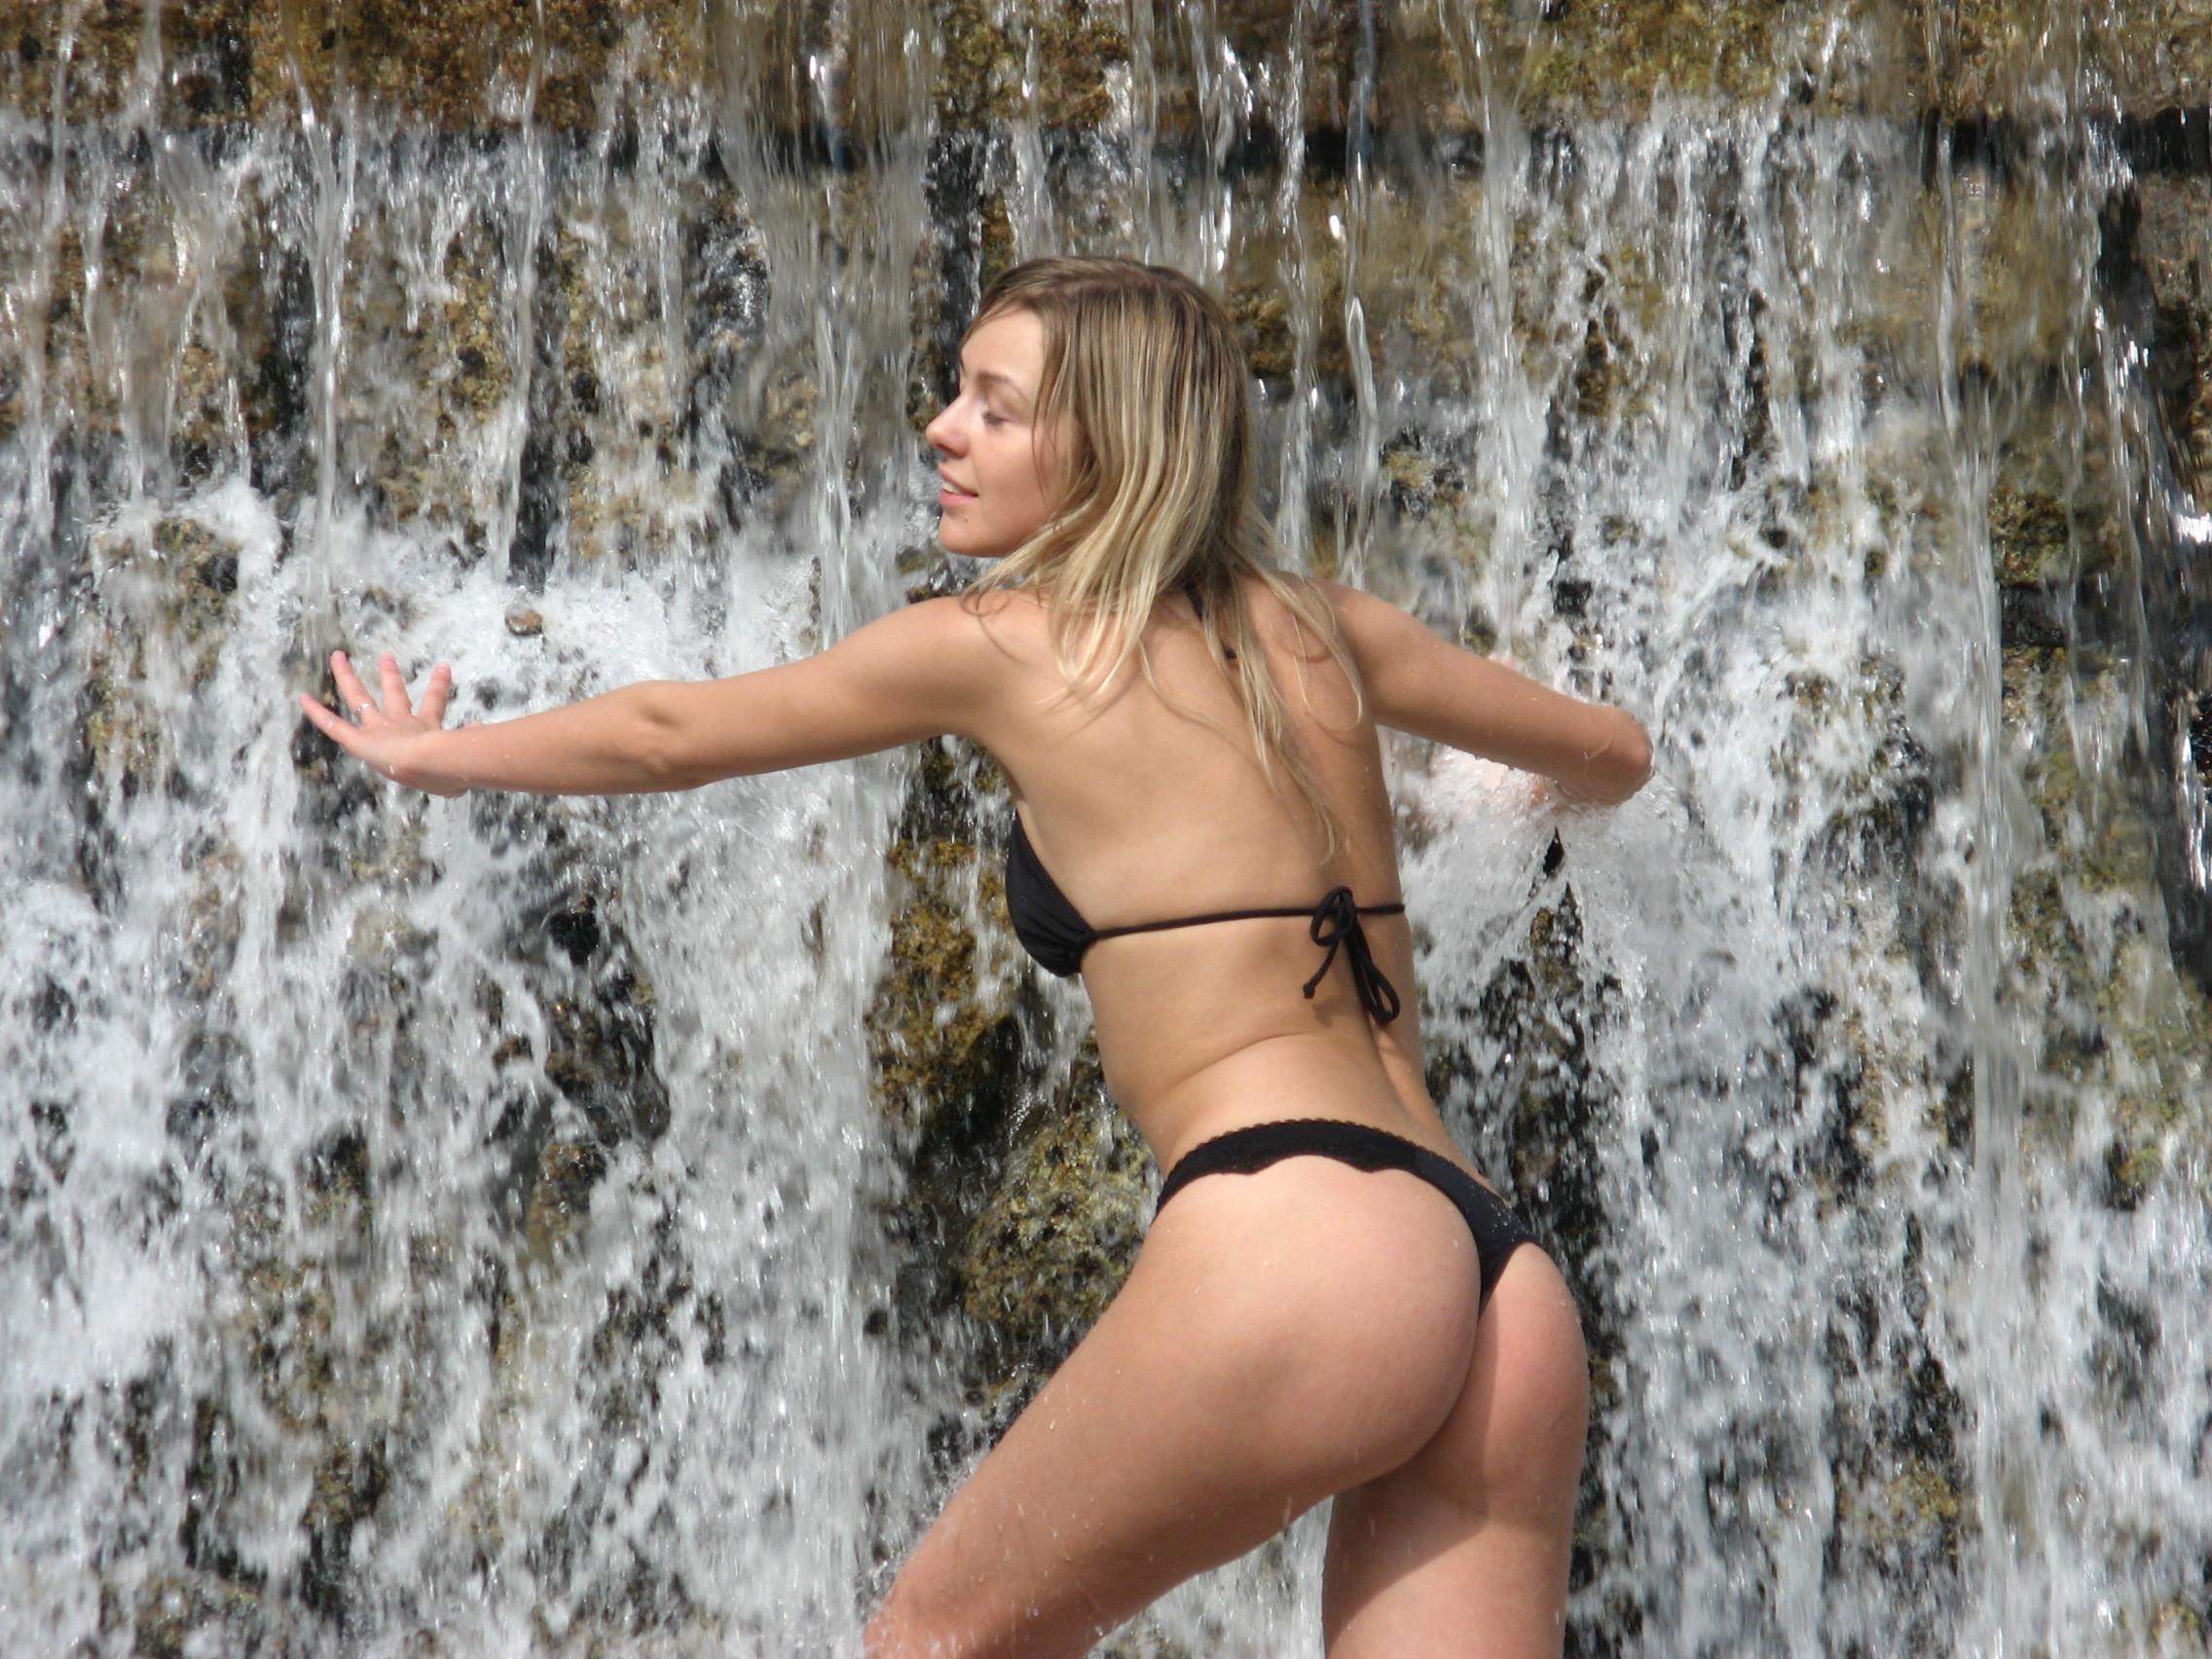 amateur-ex-girlfriend-blonde-nude-vacation-photos-11